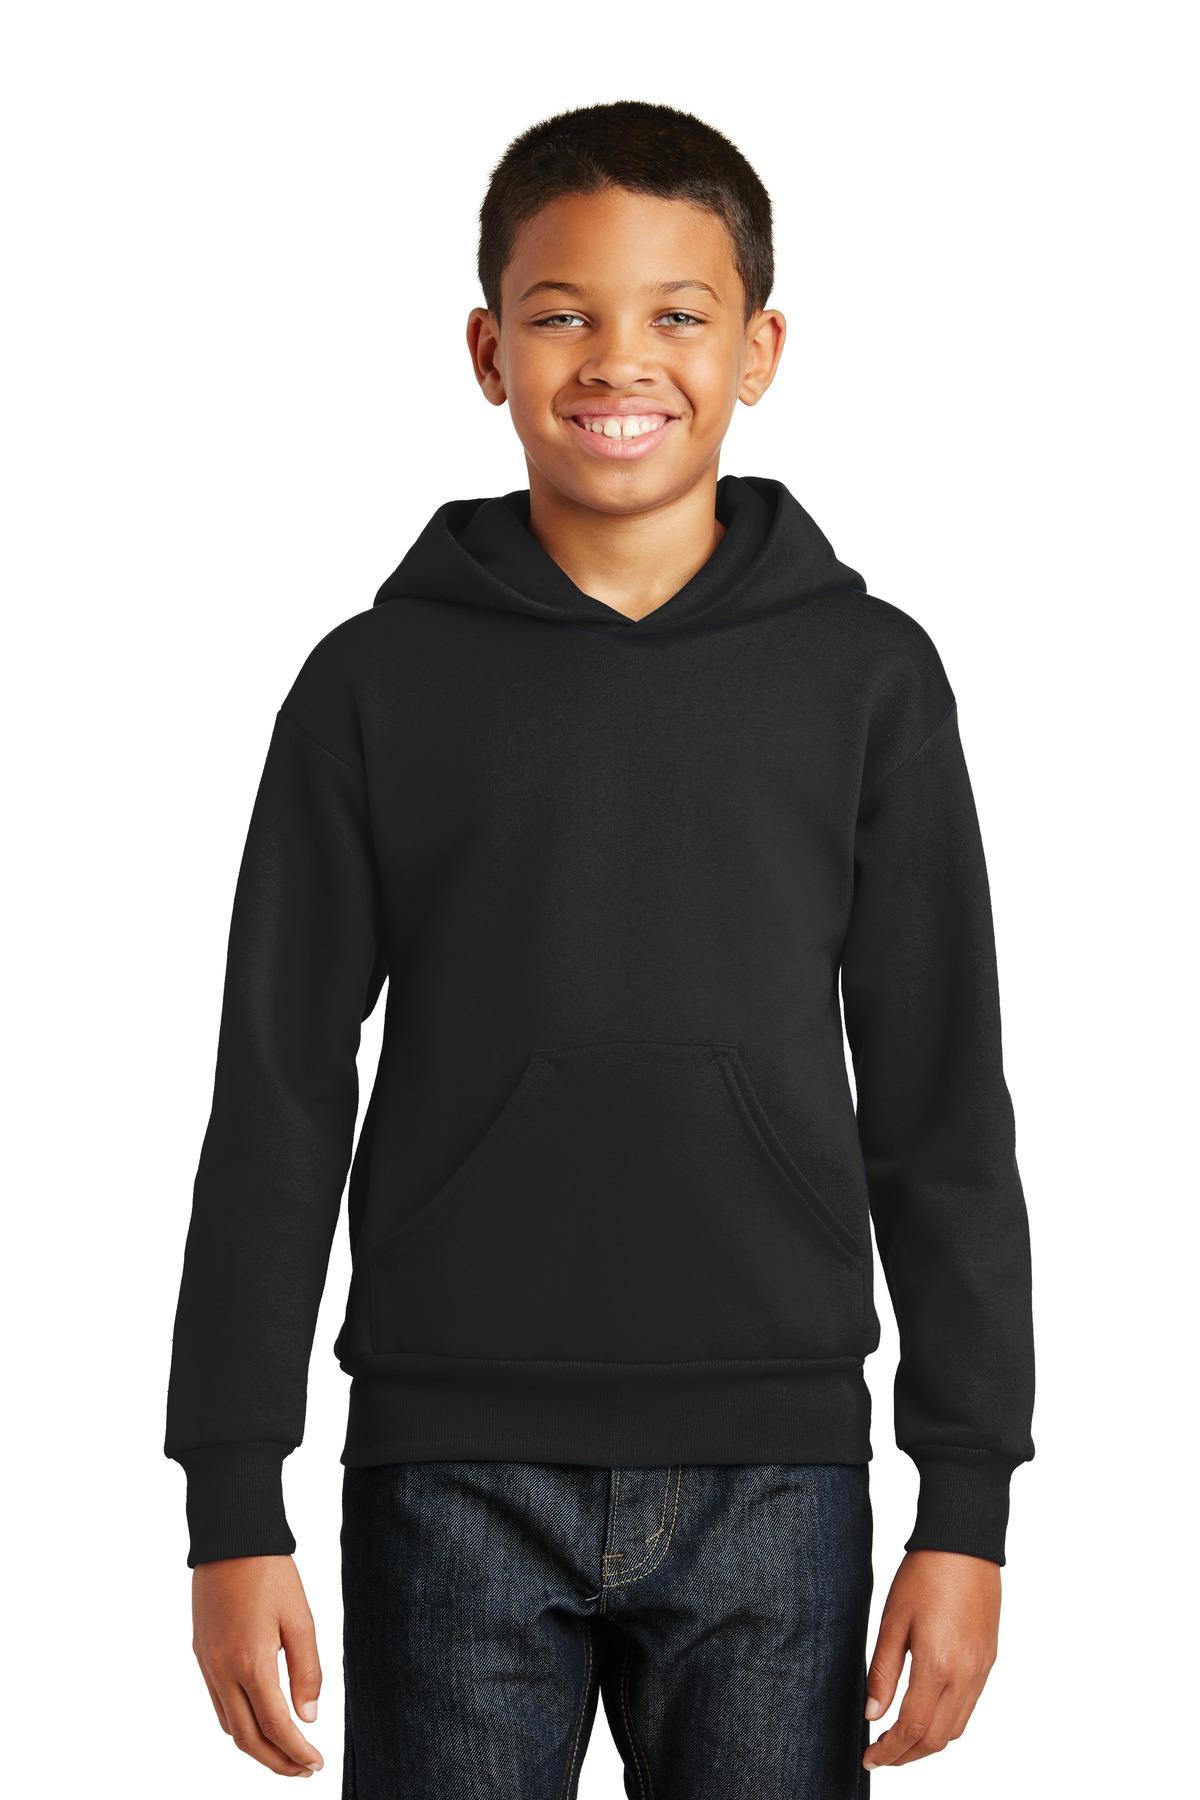 Hanes Youth EcoSmart Pullover Hooded Sweatshirt